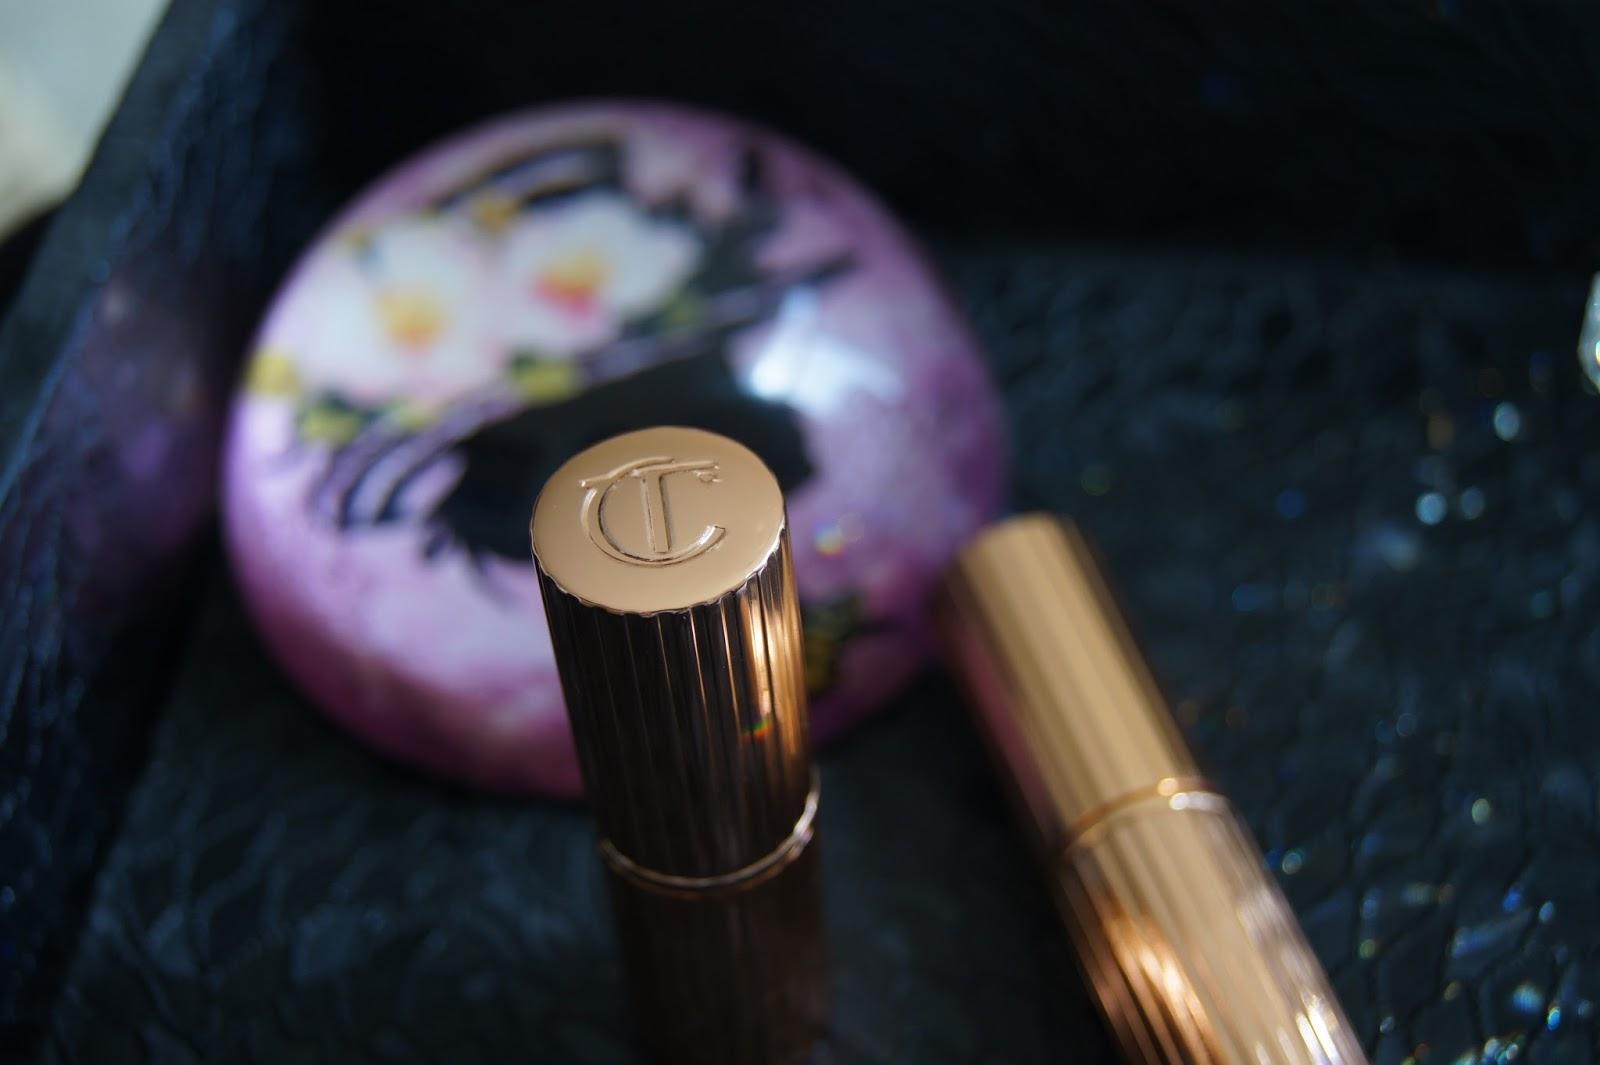 Charlotte Tilbury Matte Revolution lipstick review